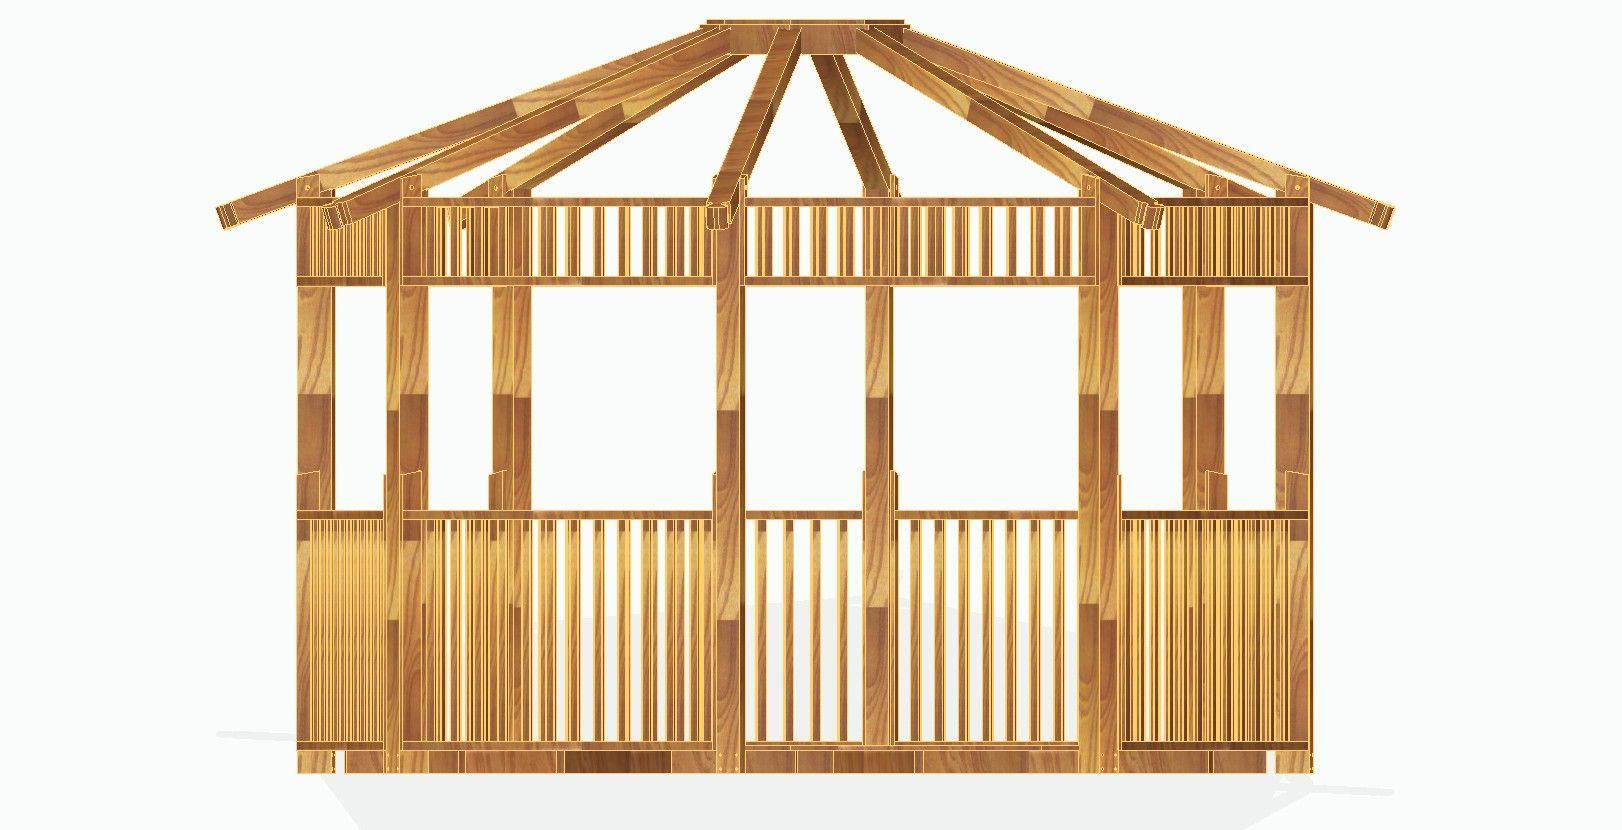 Kiosco octogonal con tejado a 16 aguas de madera kiosco for Kioscos prefabricados de madera